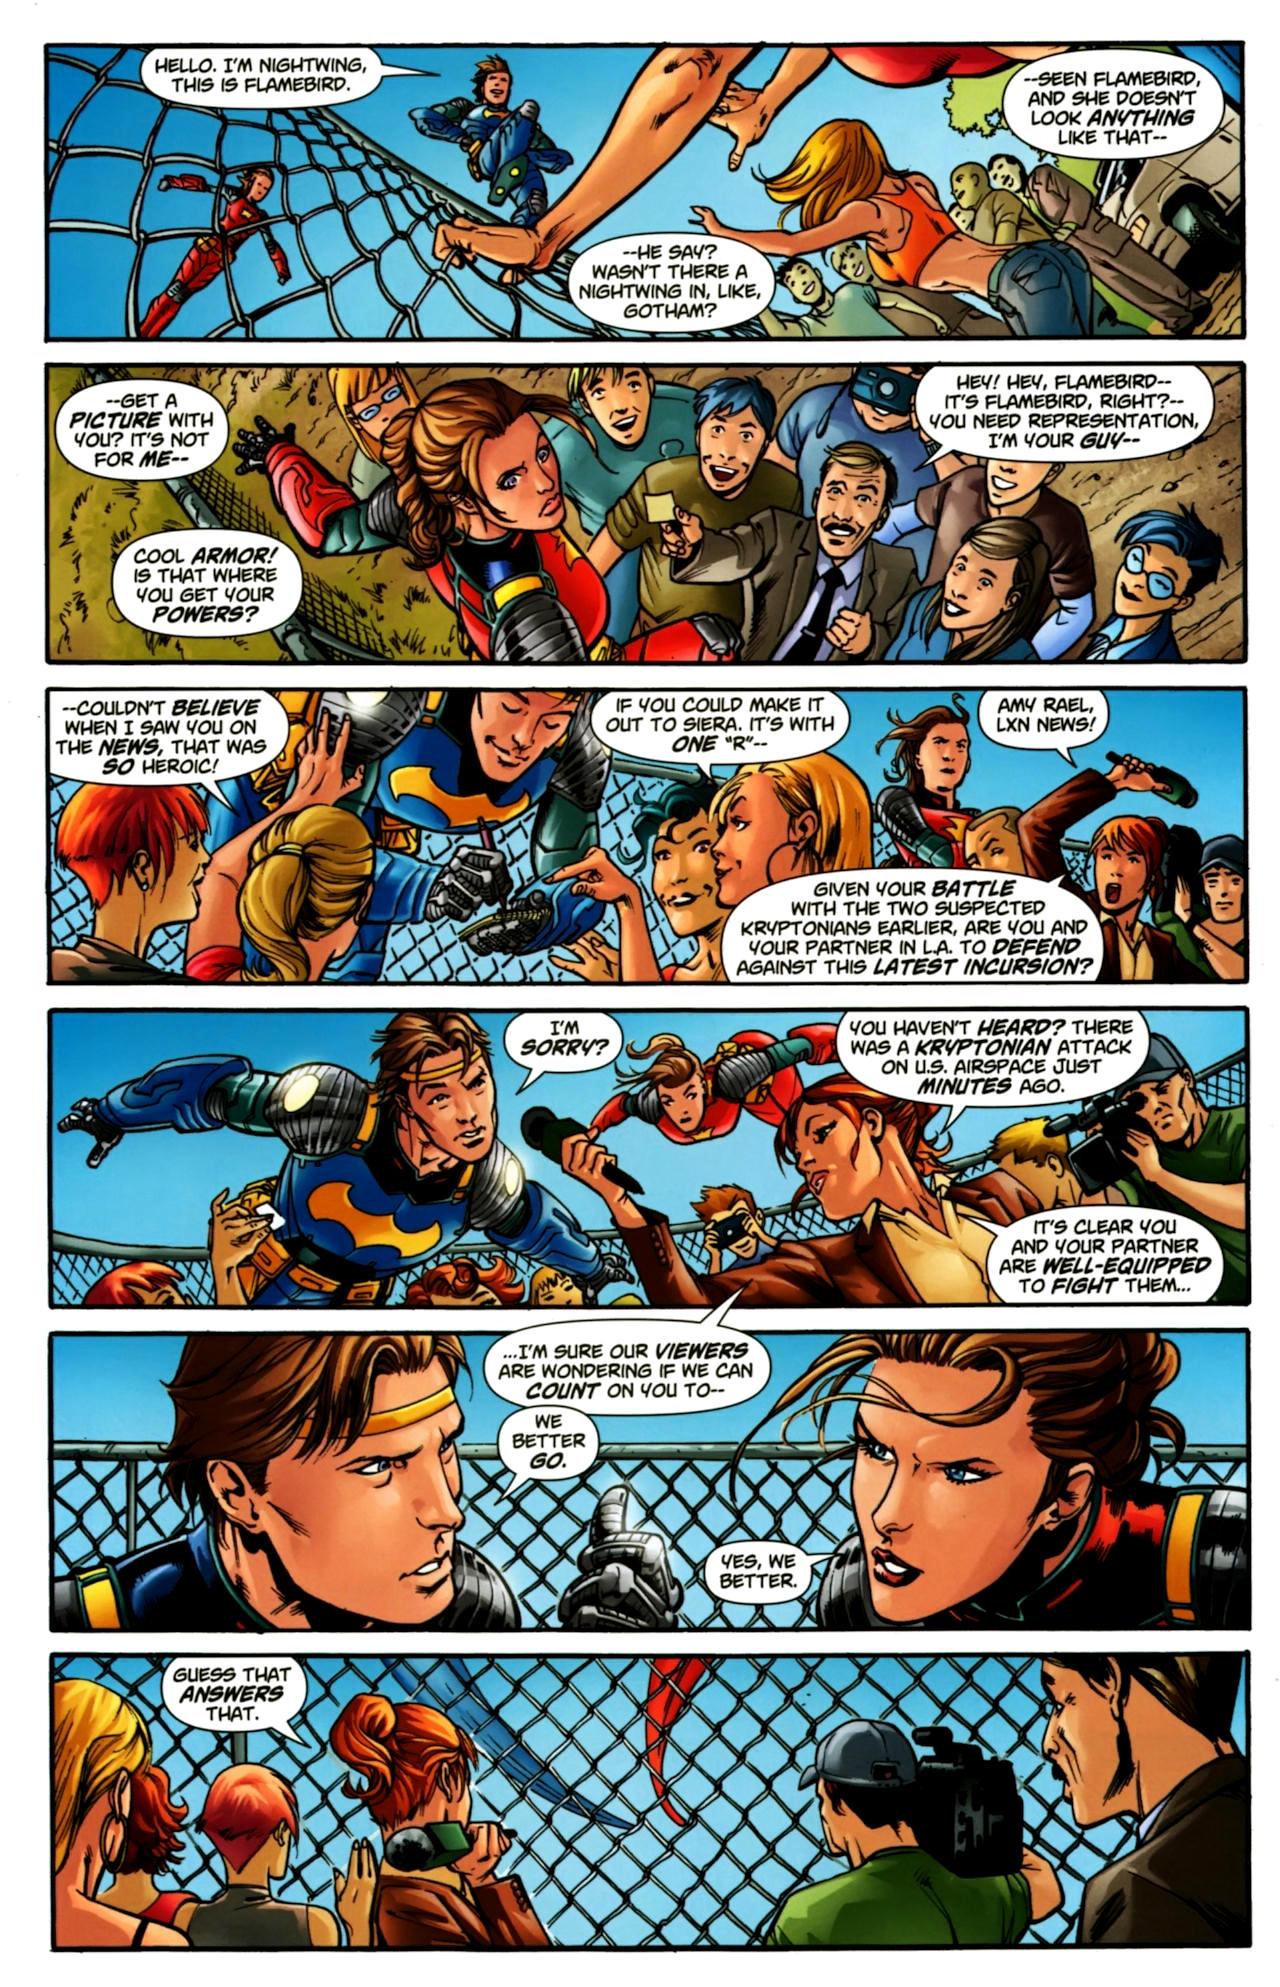 Action Comics (1938) 880 Page 10